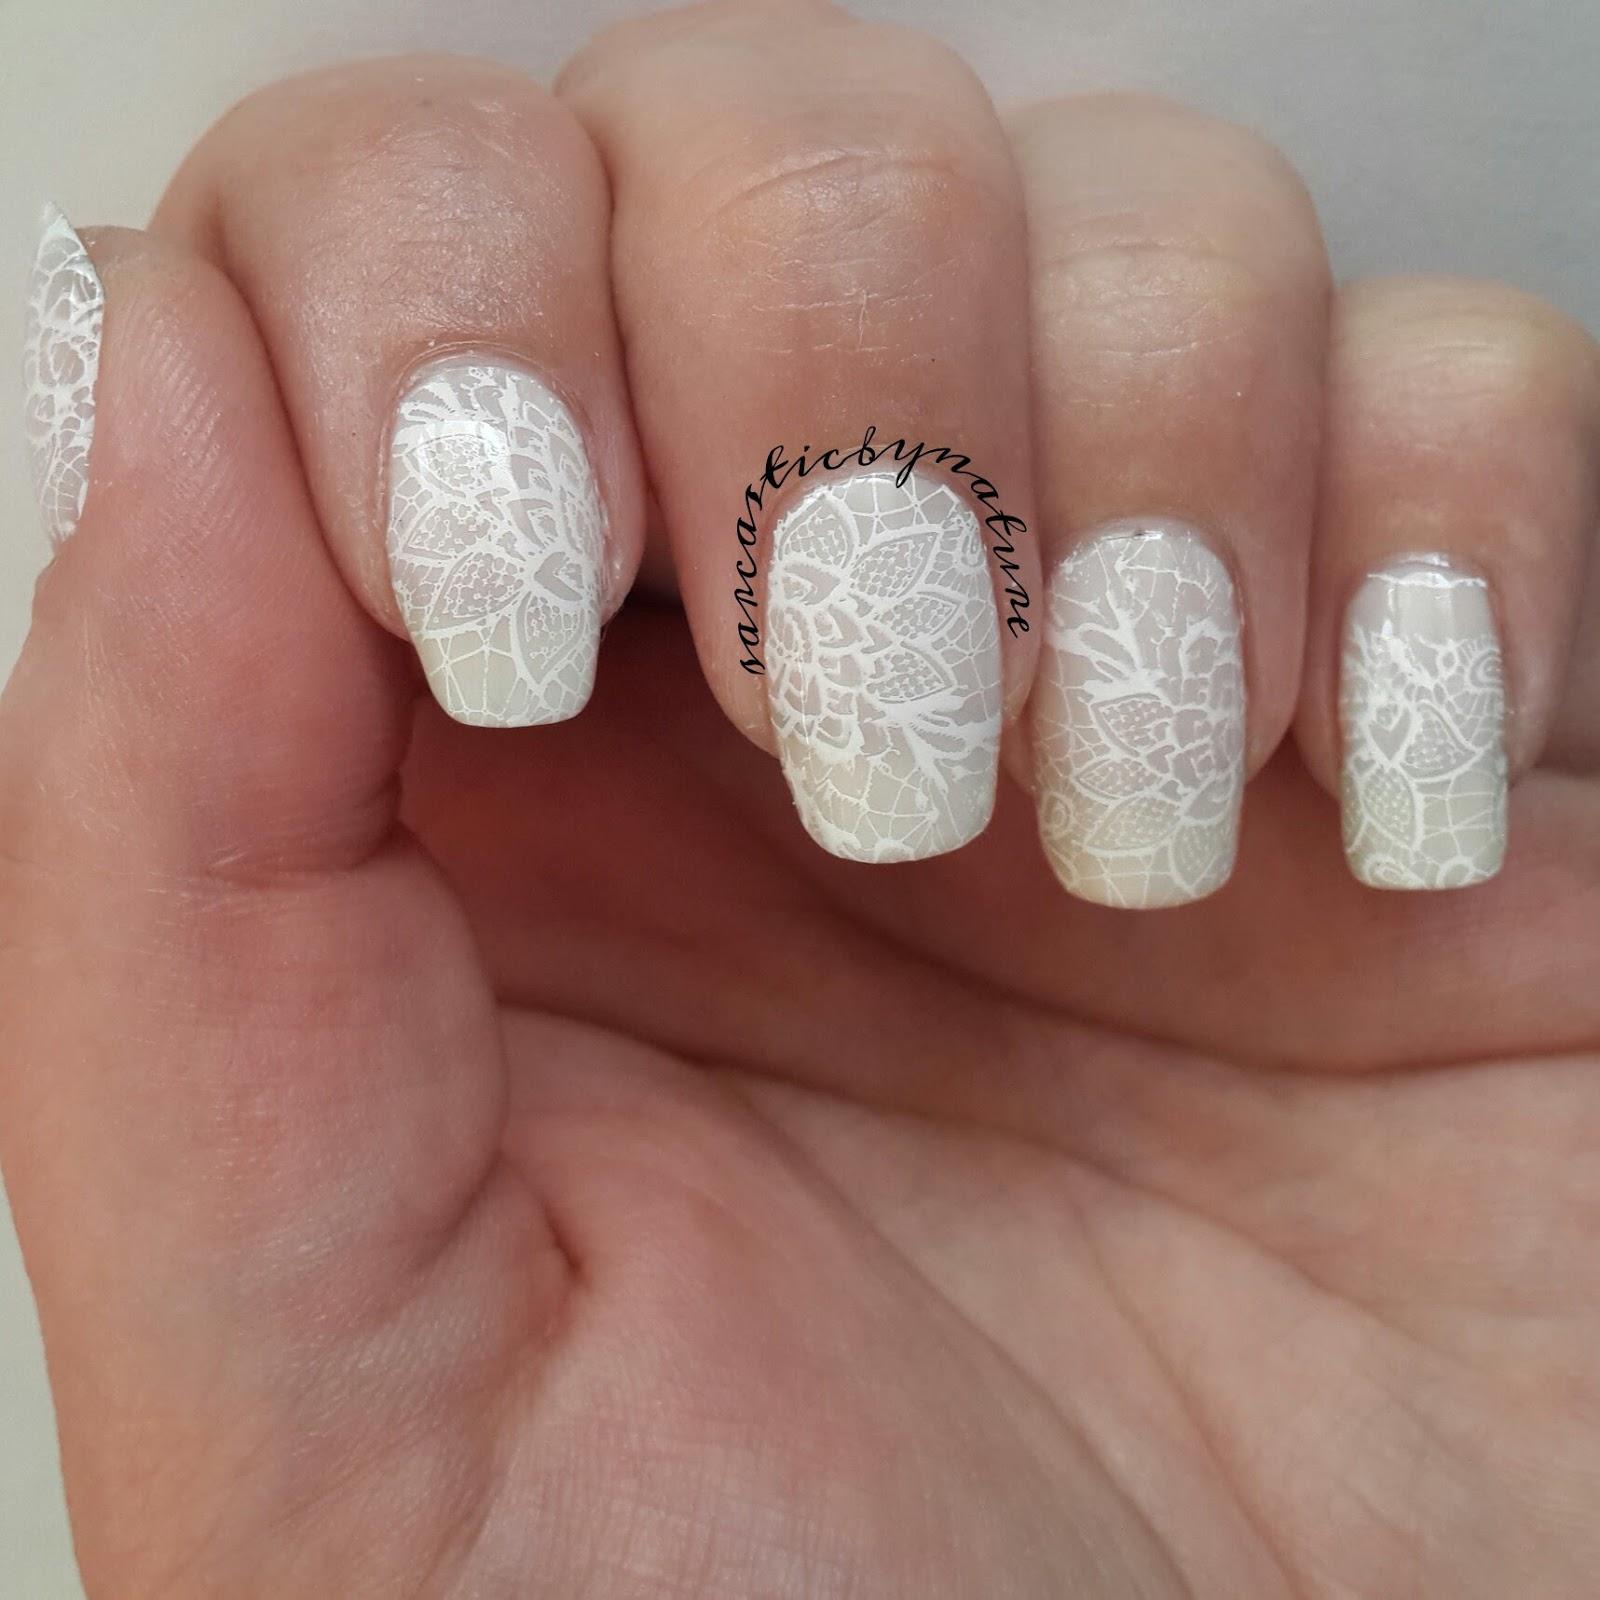 Essence Nail Art Stampy Polish Matte To Bend Light